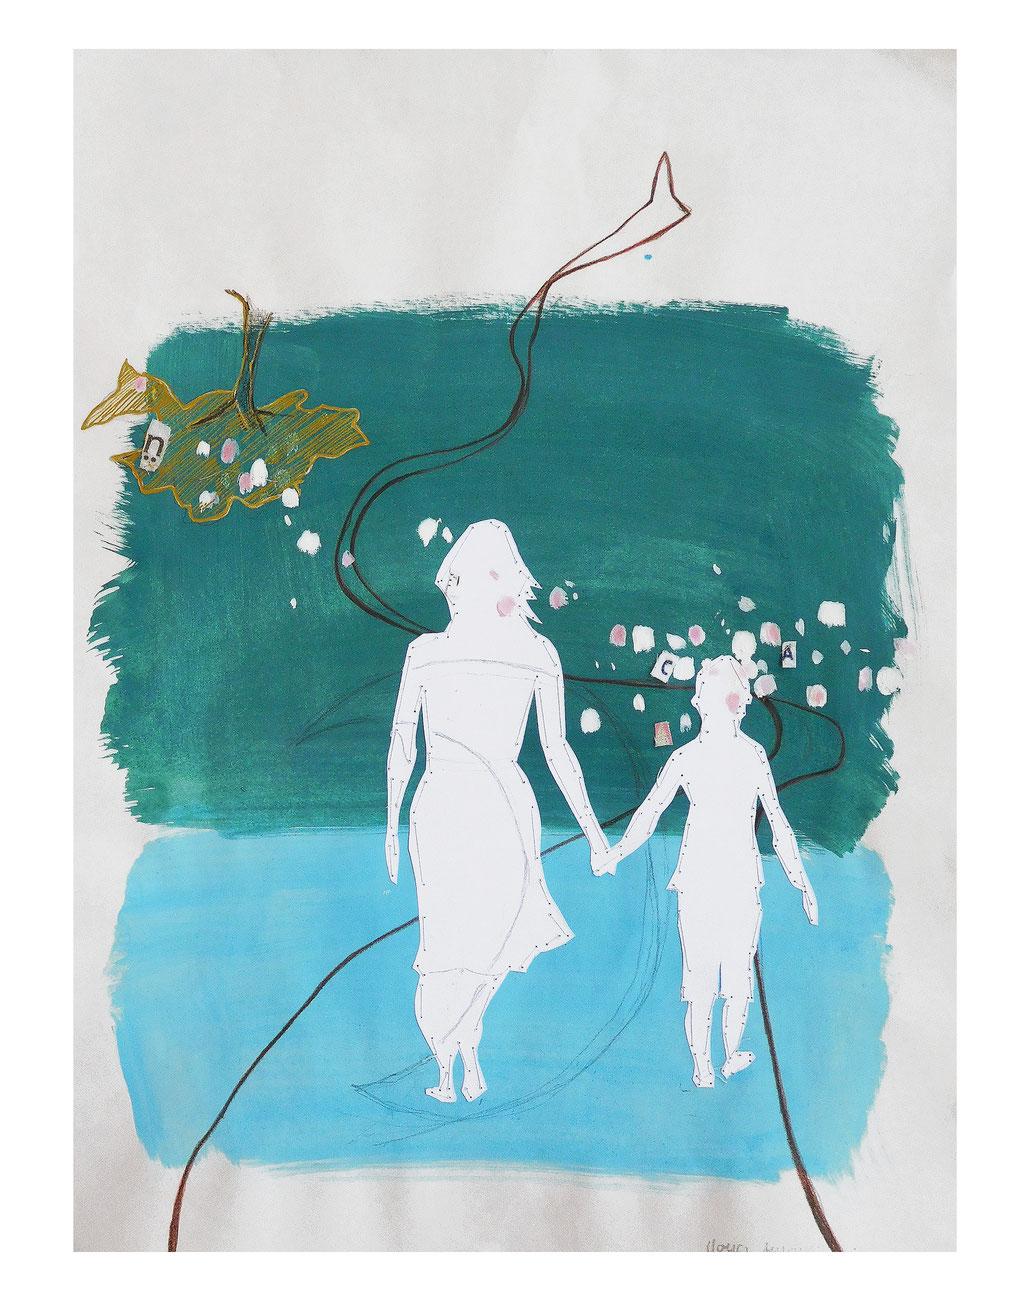 """Blütengeschwätz, 5"", 2020, Technik: Mischtechnik, Stickerei, Größe: 42cm x 30cm"